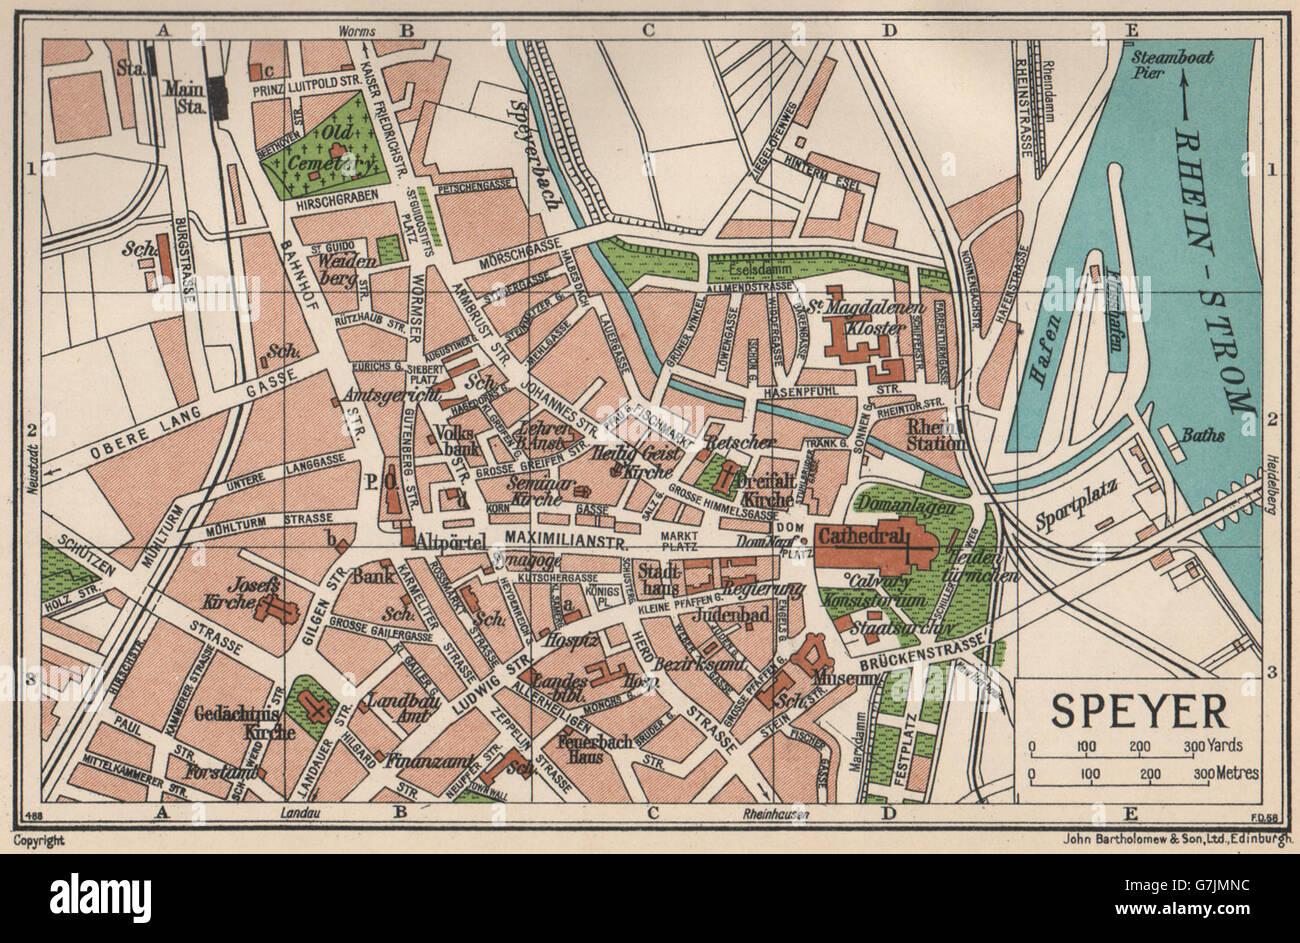 Speyer Karte Stadtplan Vintage Stadt Deutschland 1933 Stockfoto